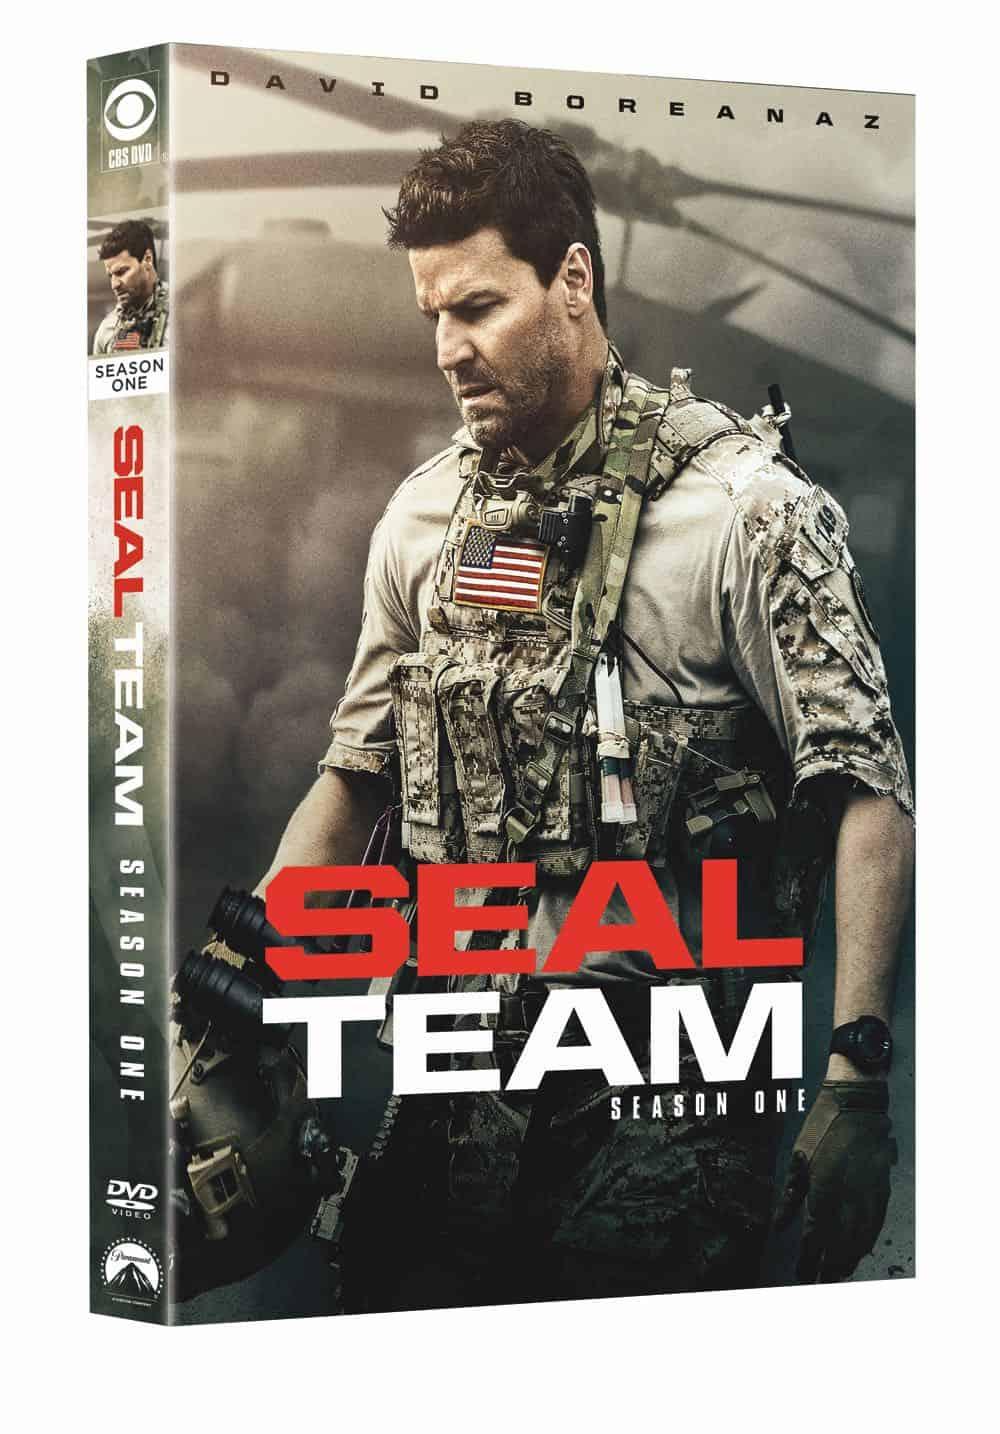 Seal Team Season 1 DVD Cover 2